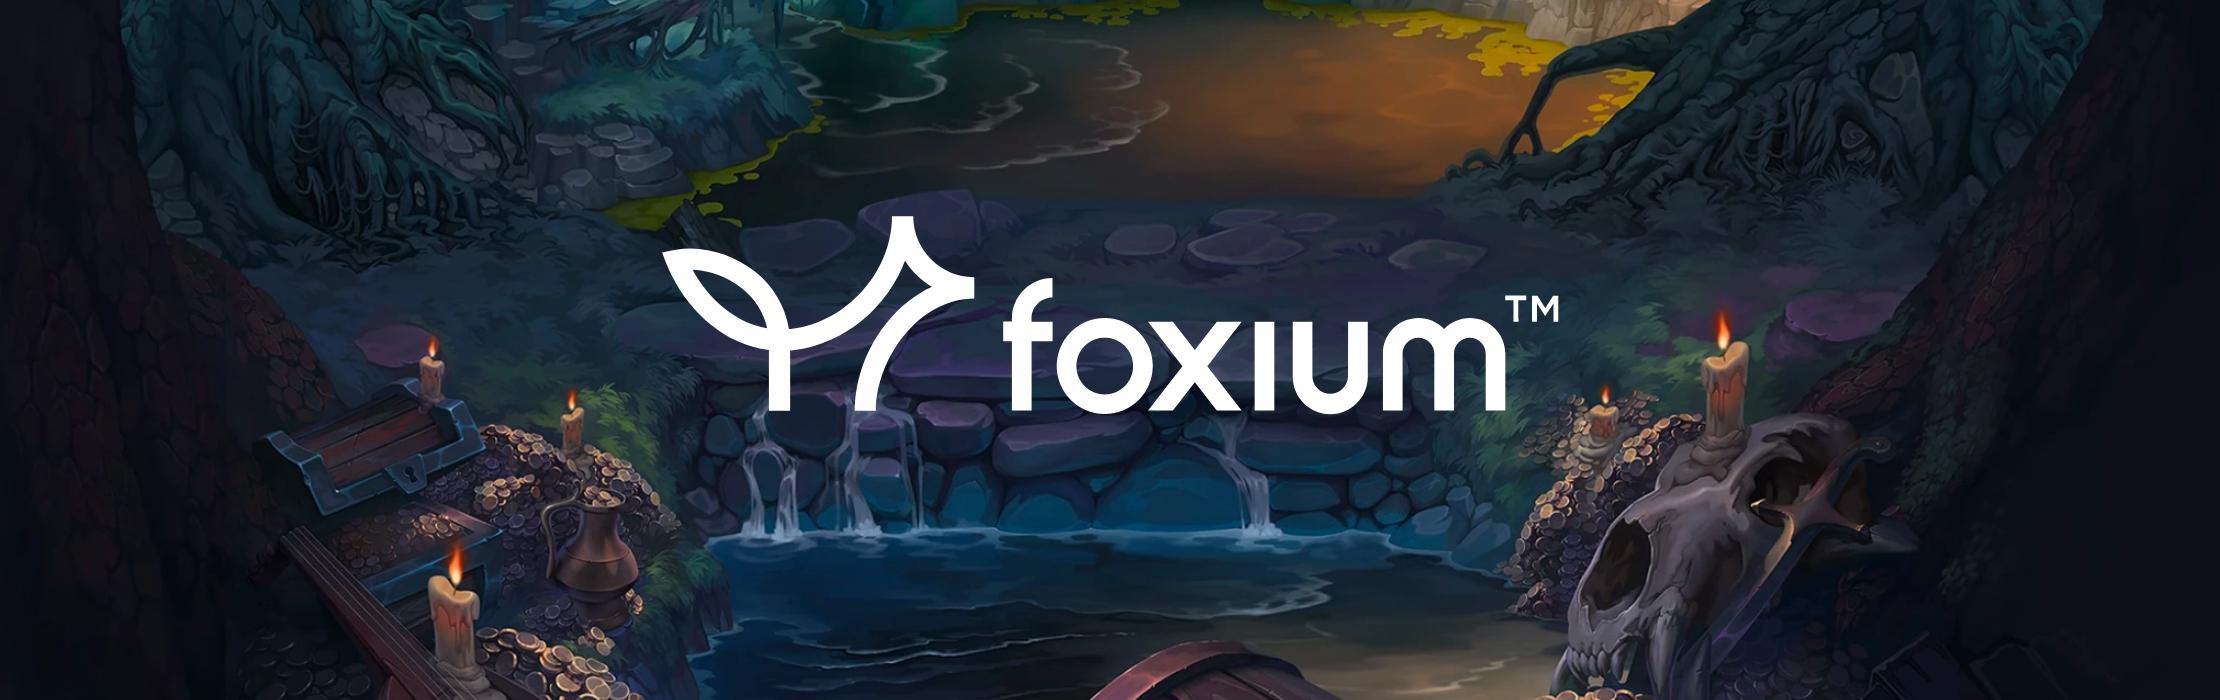 foxium-kasinot